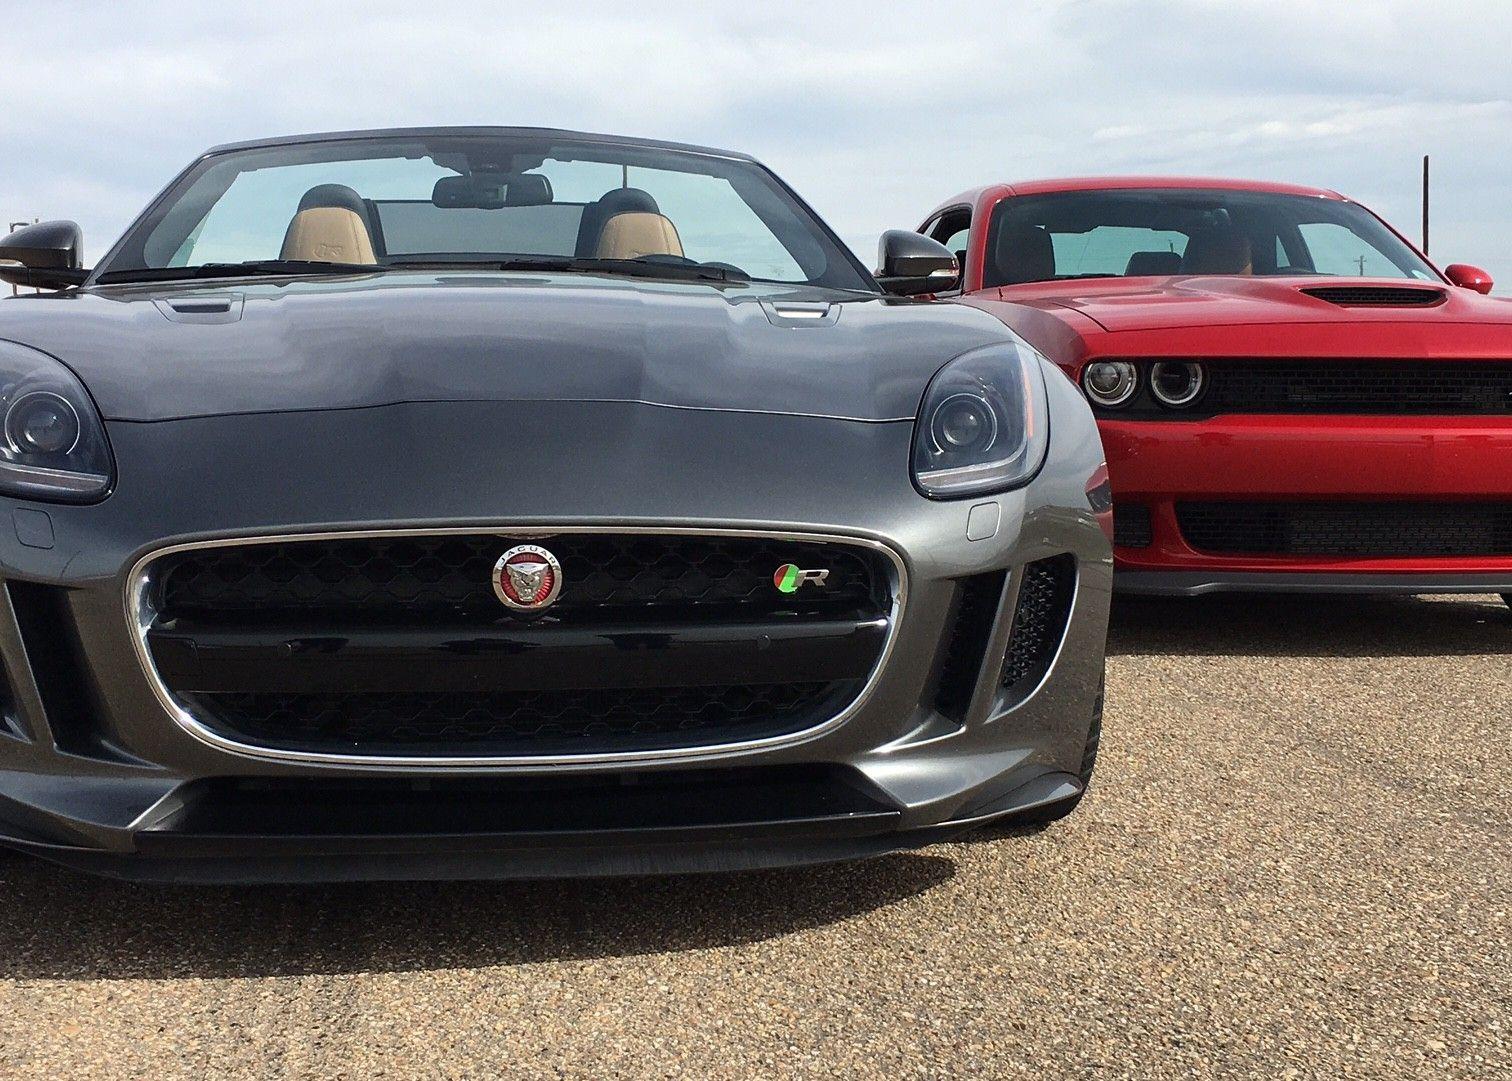 Charming Dodge Challenger Hellcat VS Jaguar F Type R